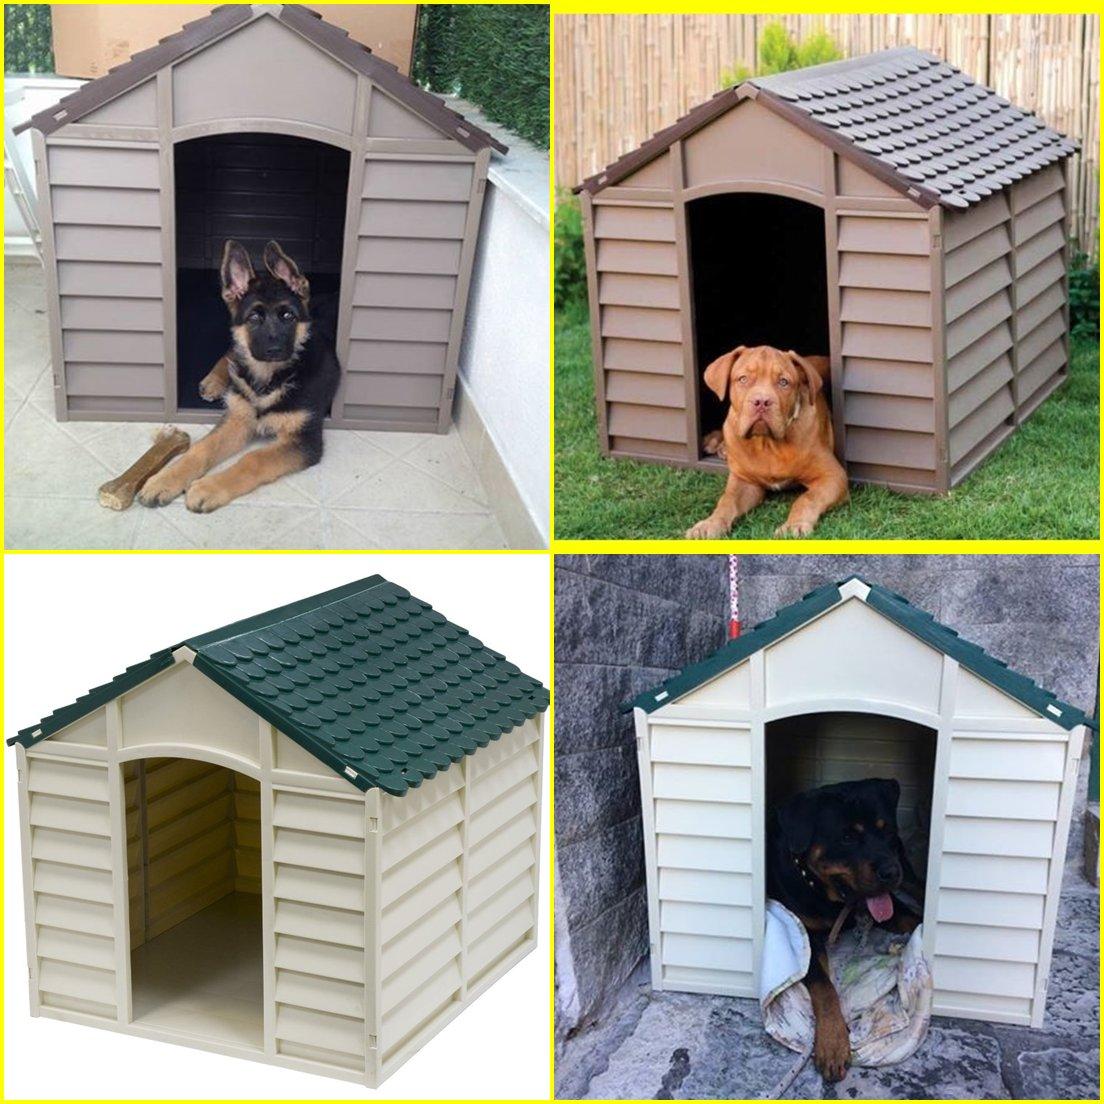 Cuccia Per Cani Esterno Giardino At Fmarikaofficial Twitter